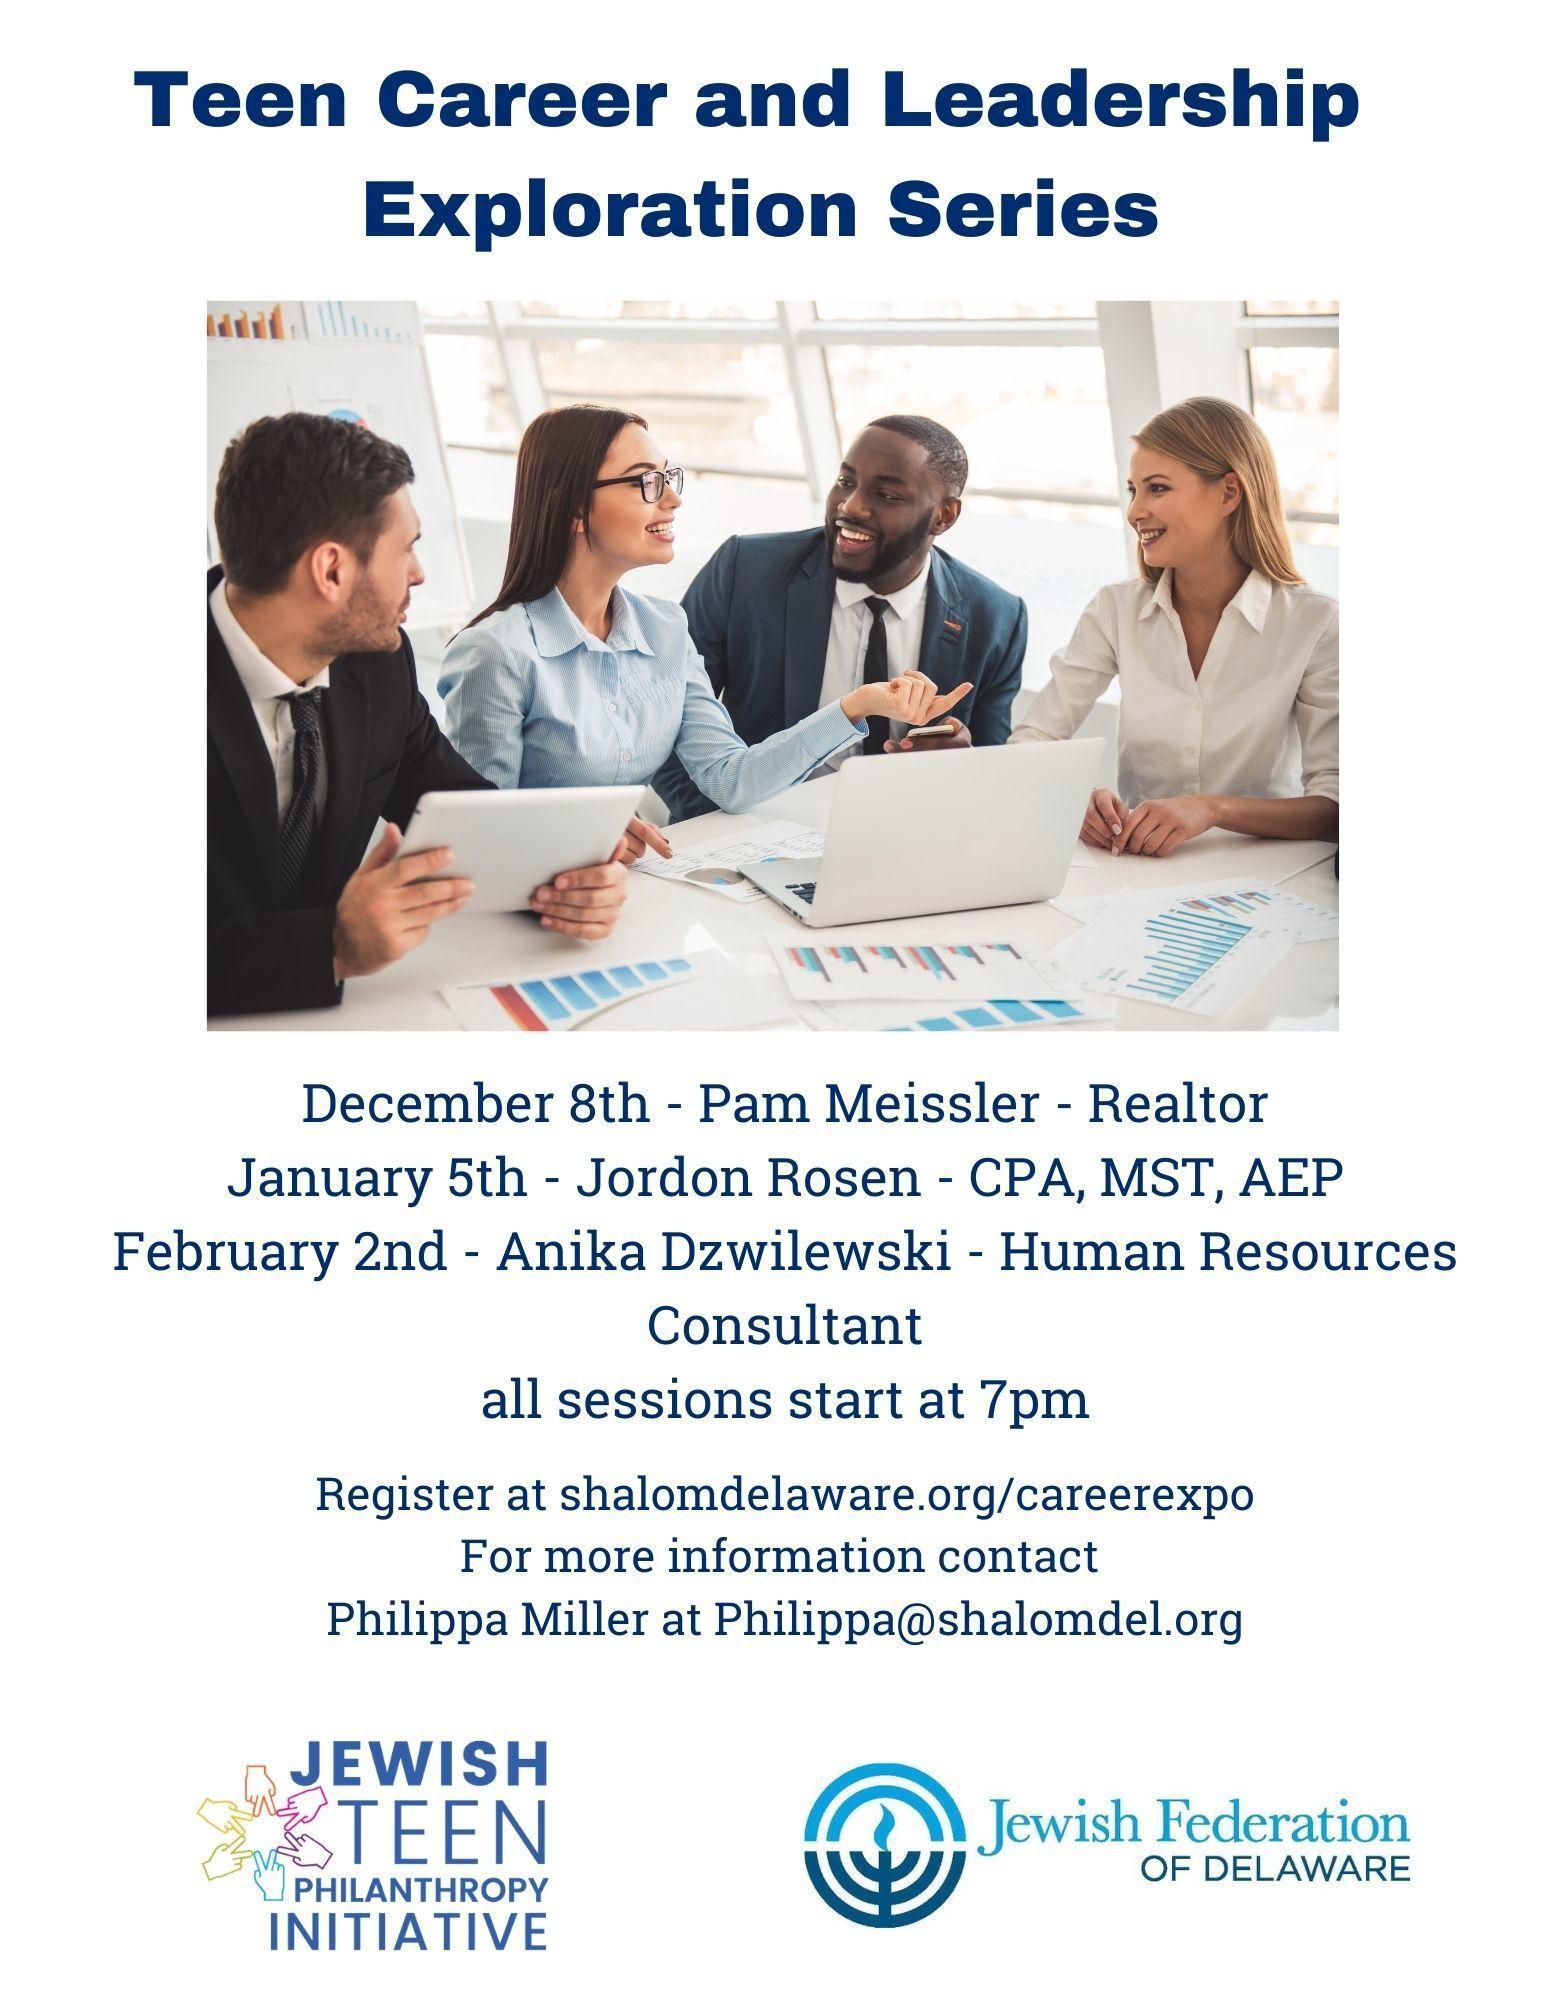 Teen Career and Leadership Exploration